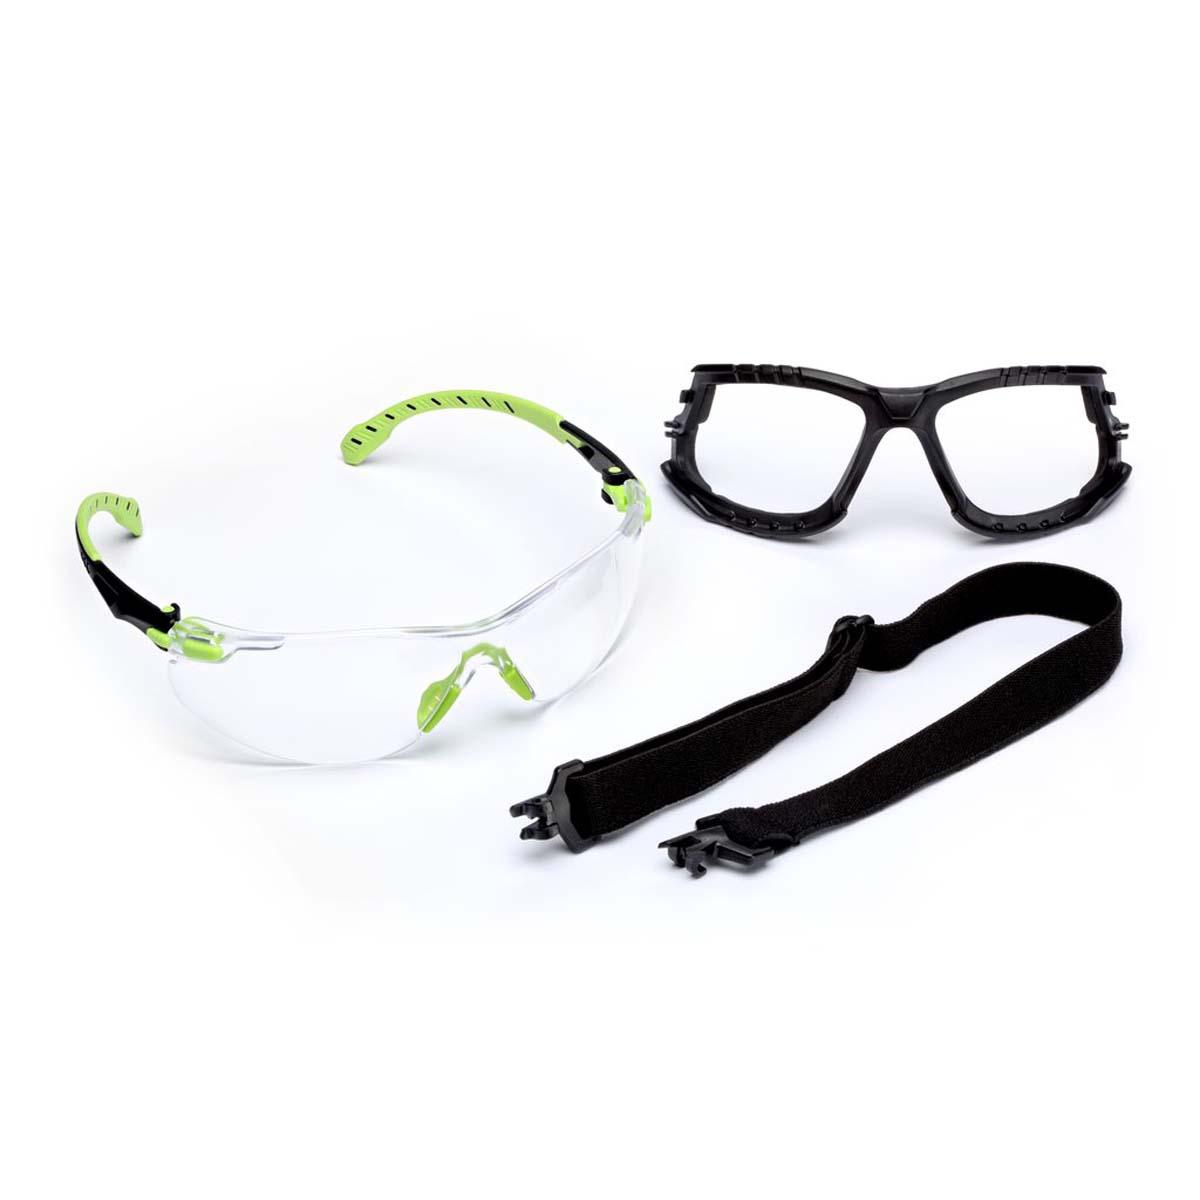 "3Mâ""¢ Solusâ""¢ 1000-Series S1201SGAF-KT, Kit, Foam, Strap, Green/Black, Clear Scotchgardâ""¢ Anti-fog Lens"